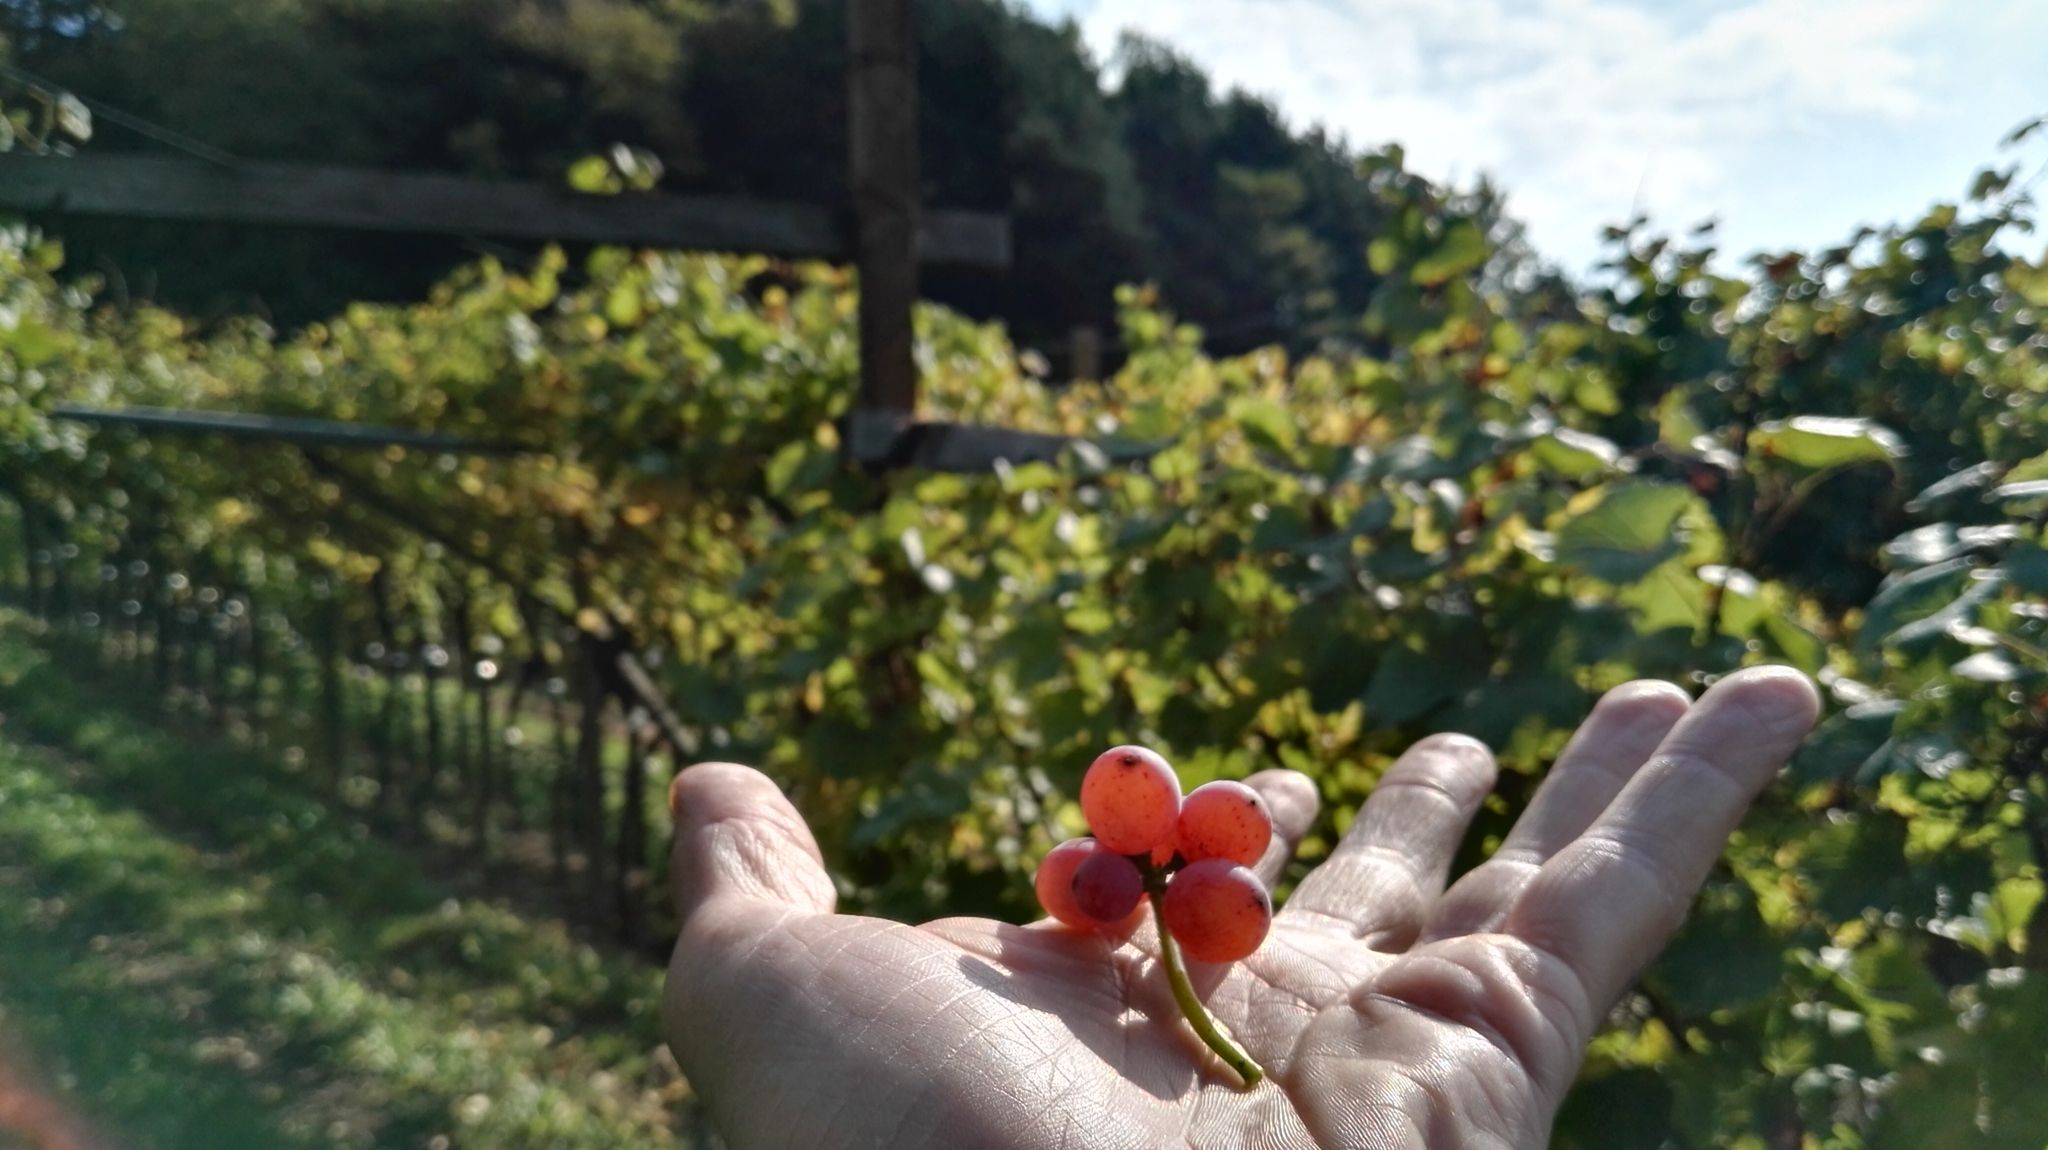 #mezzacorona #wine #vino #vinotube #trentino #dolomite #rotari #trentodoc #cembra